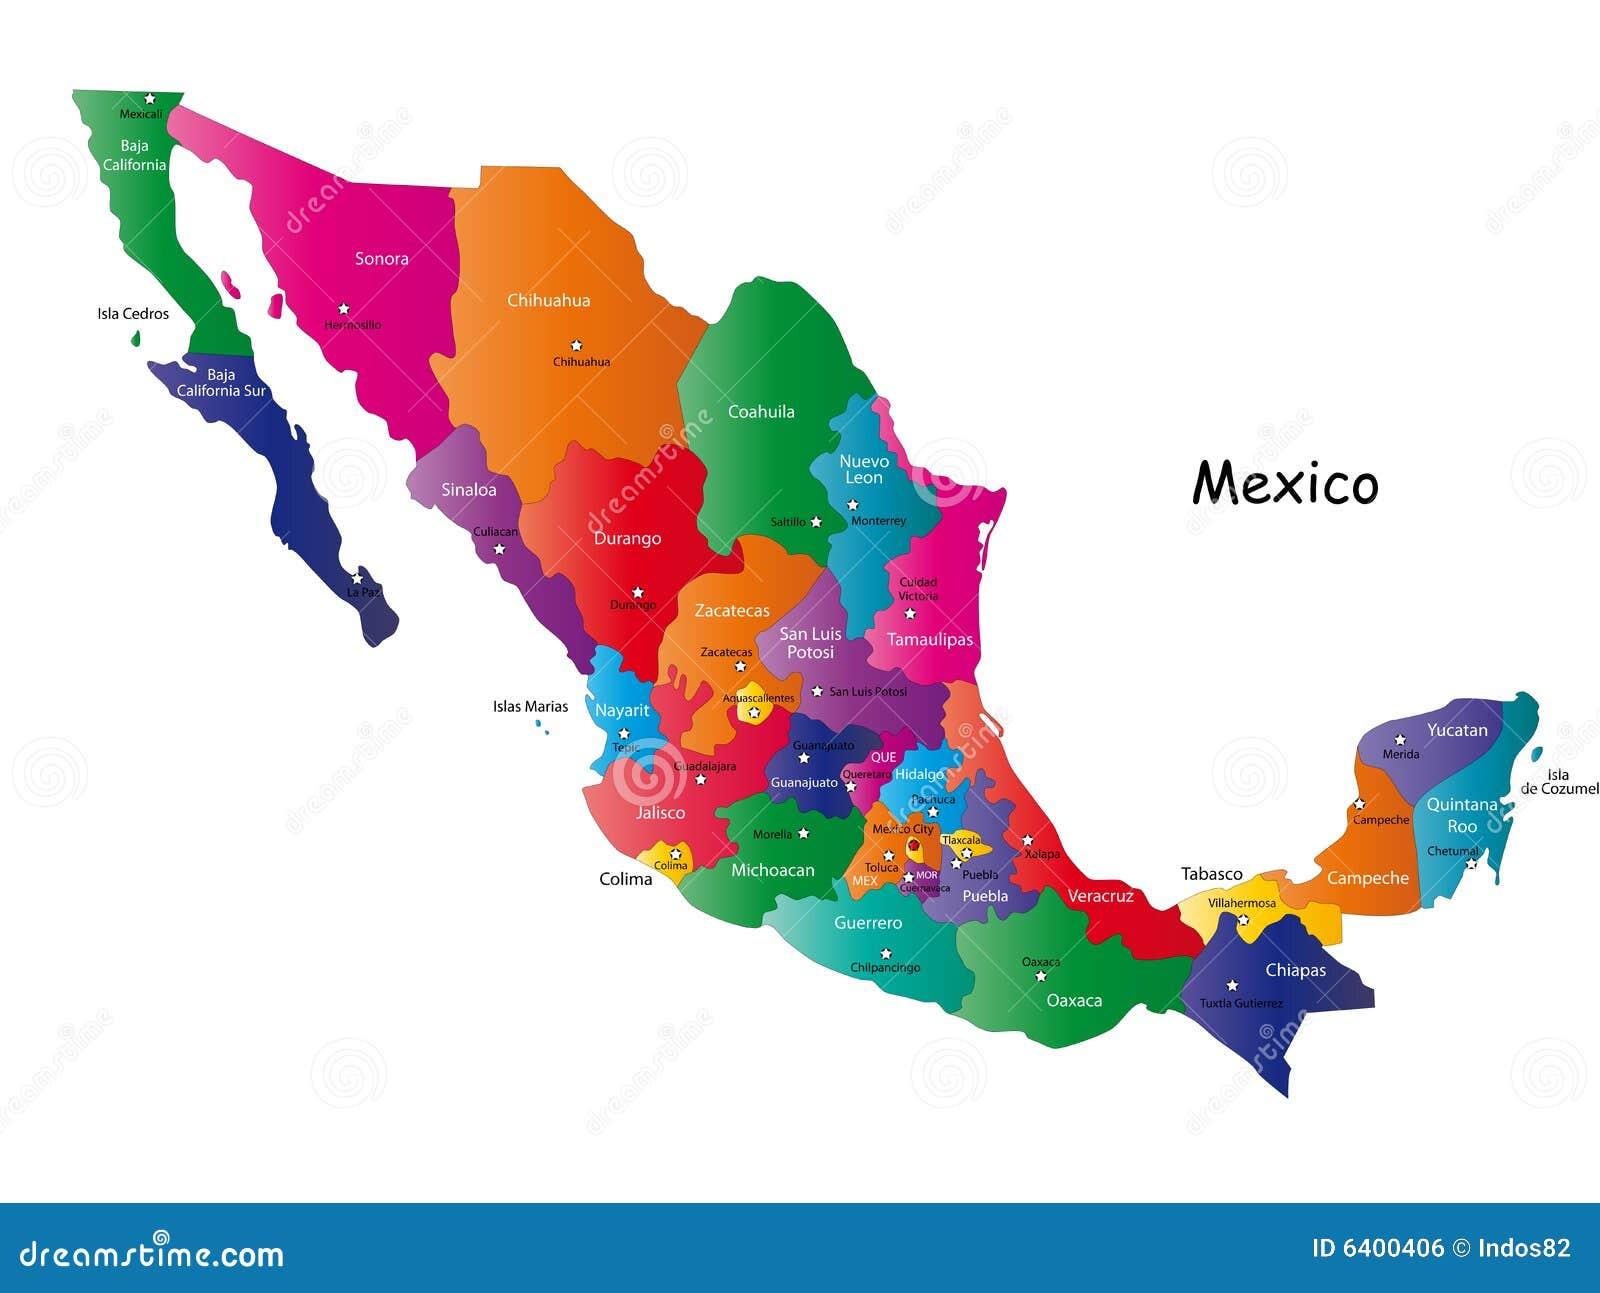 Honduras Mexico Map.Mexico Map Stock Vector Illustration Of Honduras Graphing 6400406